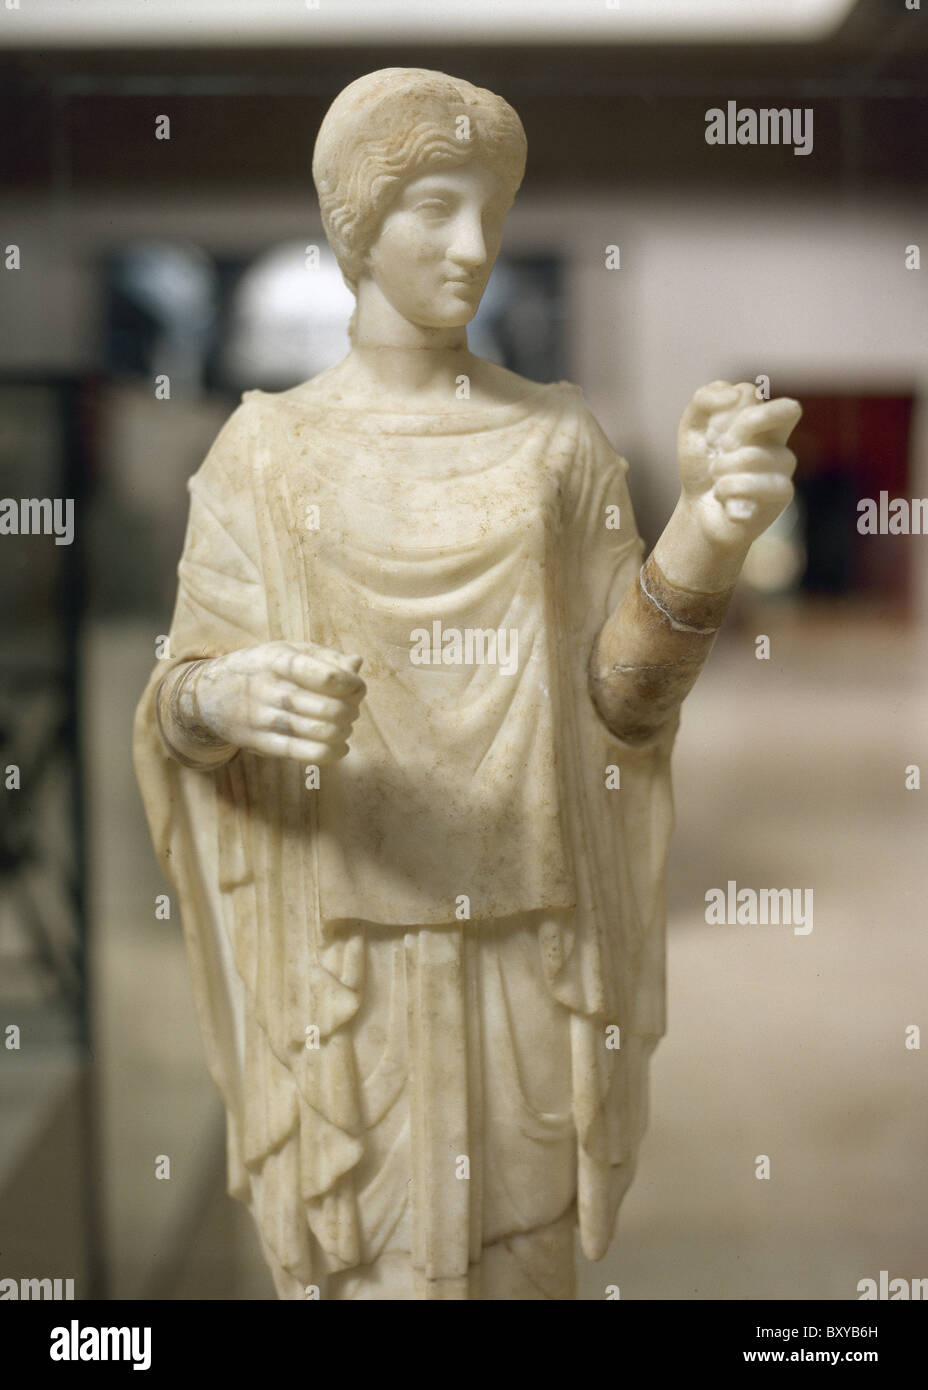 Artemis. Huntress goddess. Roman marble sculpture, dating from the second century. Ephesus Museum. Selçuk. Turkey. Stock Photo